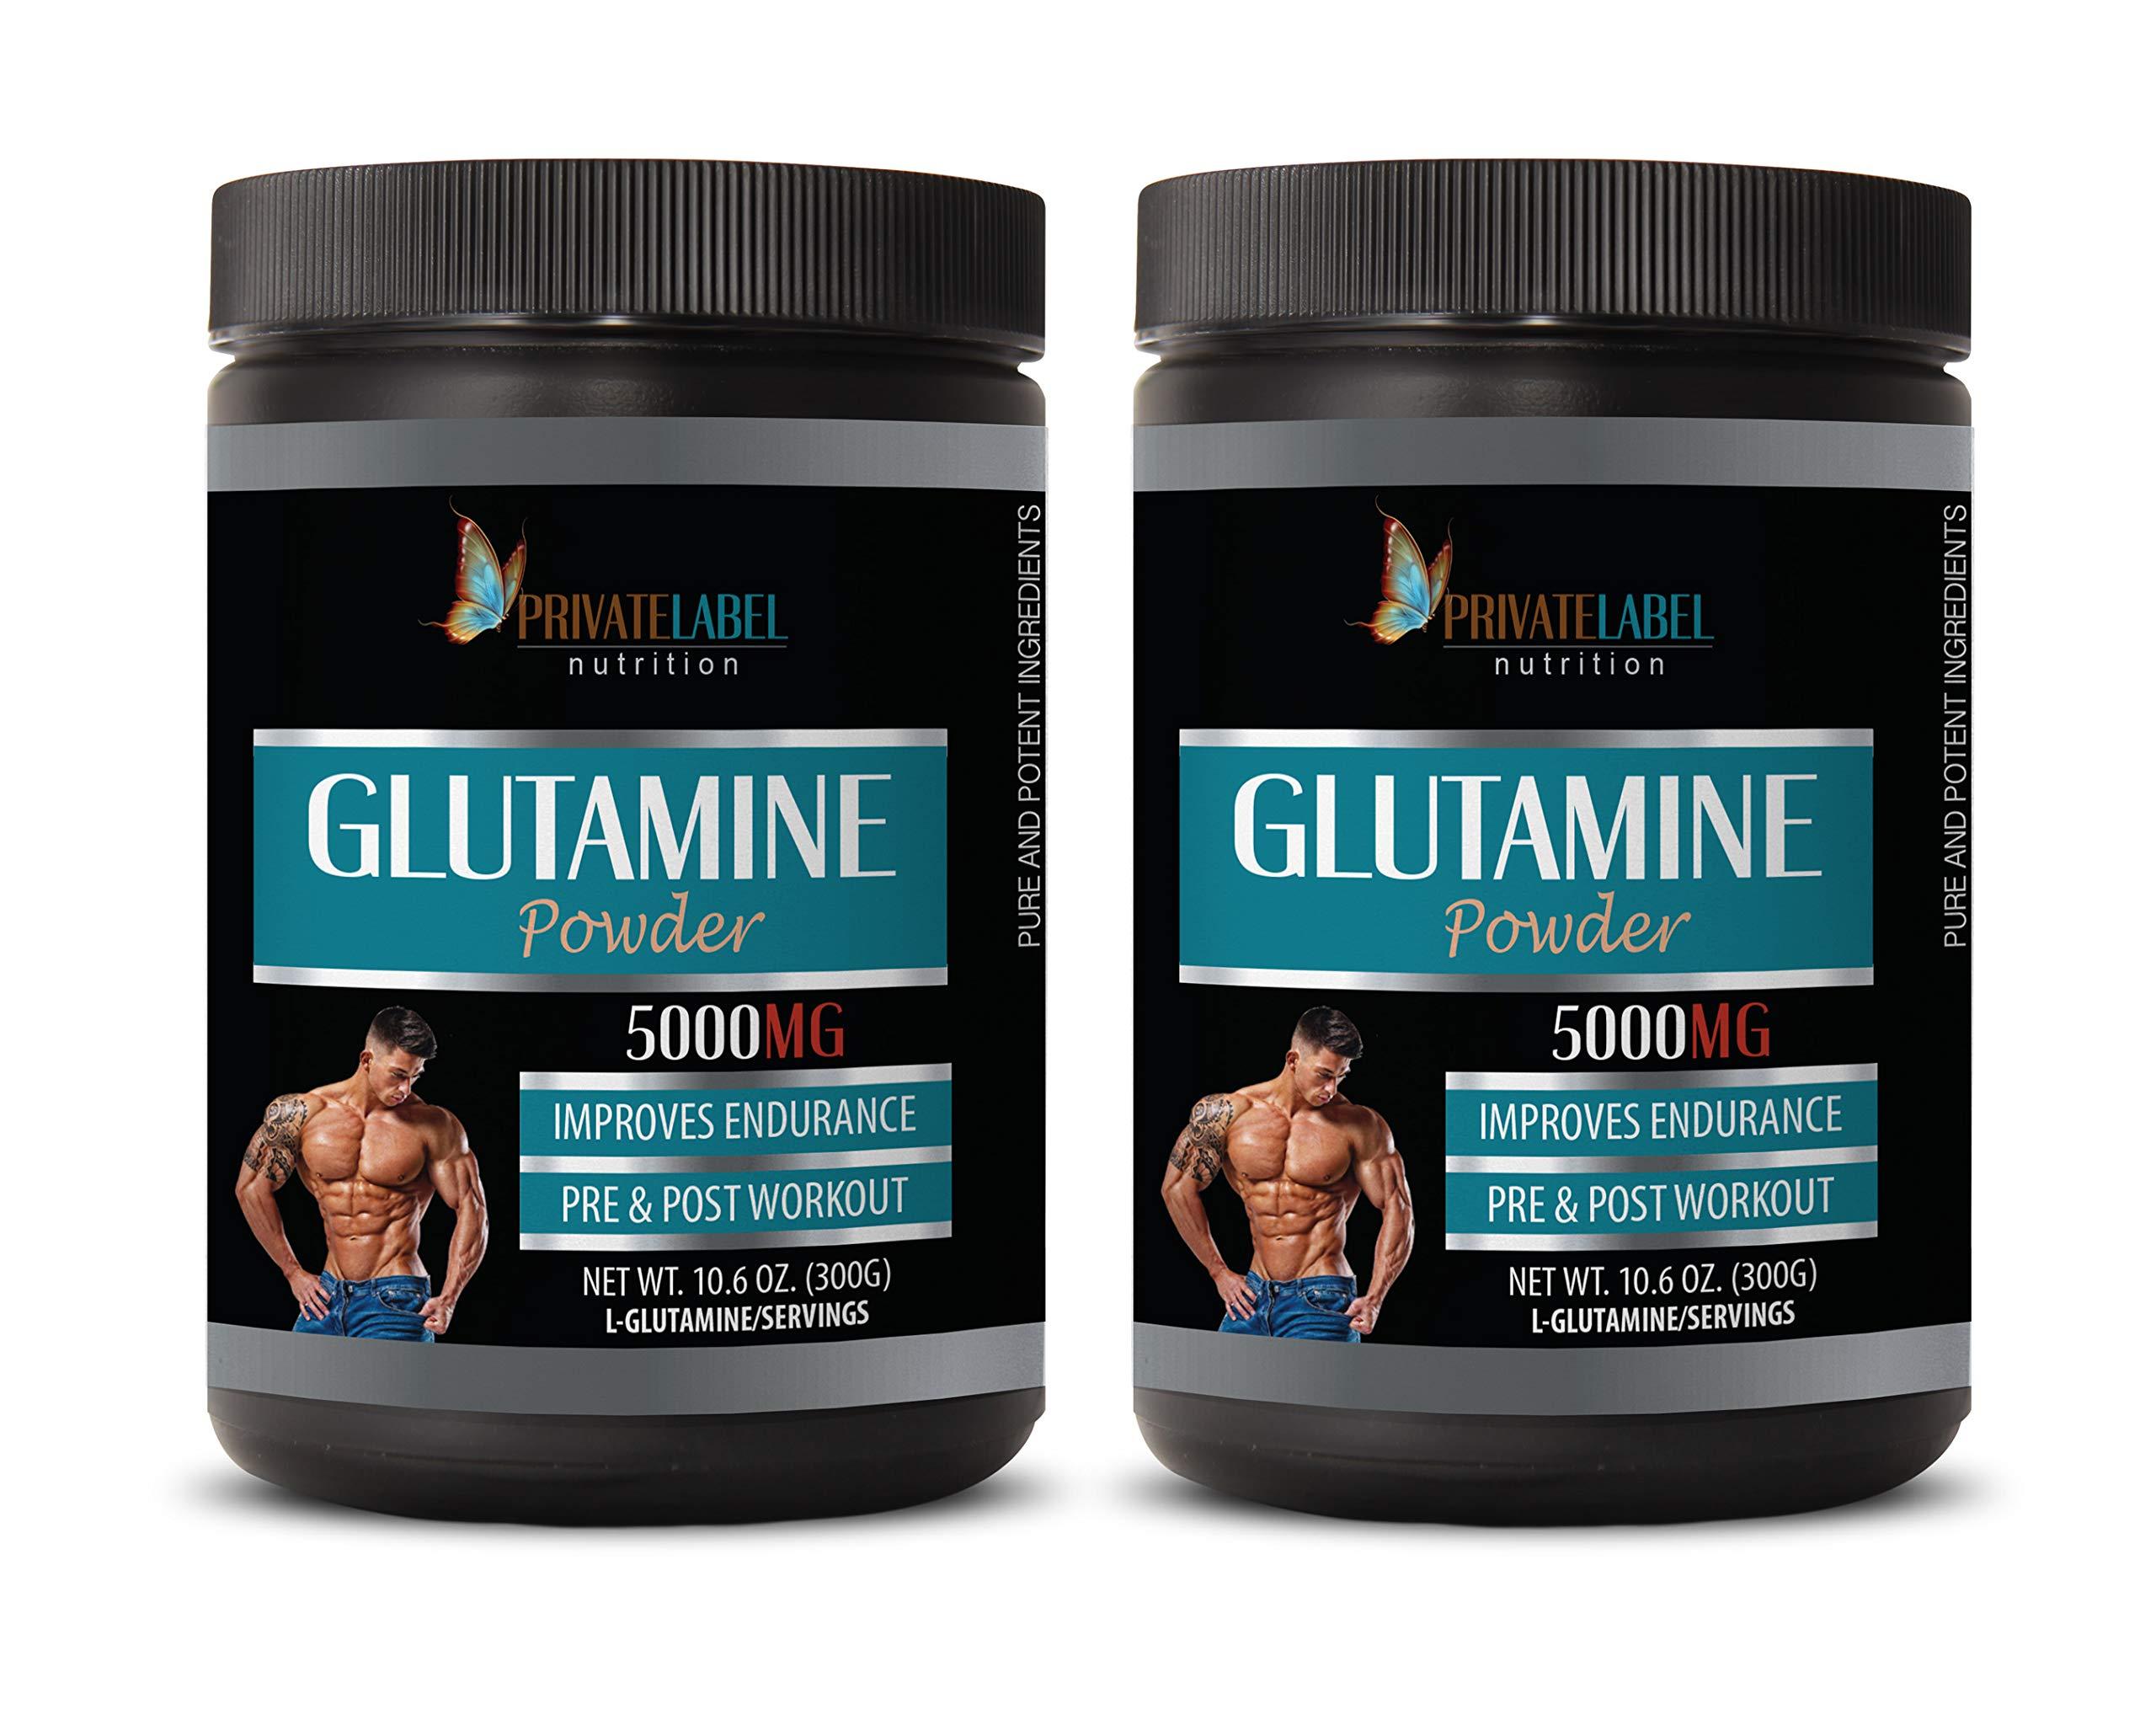 Muscle Pump Supplements - GLUTAMINE 5000MG Powder - Improves Endurance - glutamine Powder - 2 Cans 600 Grams